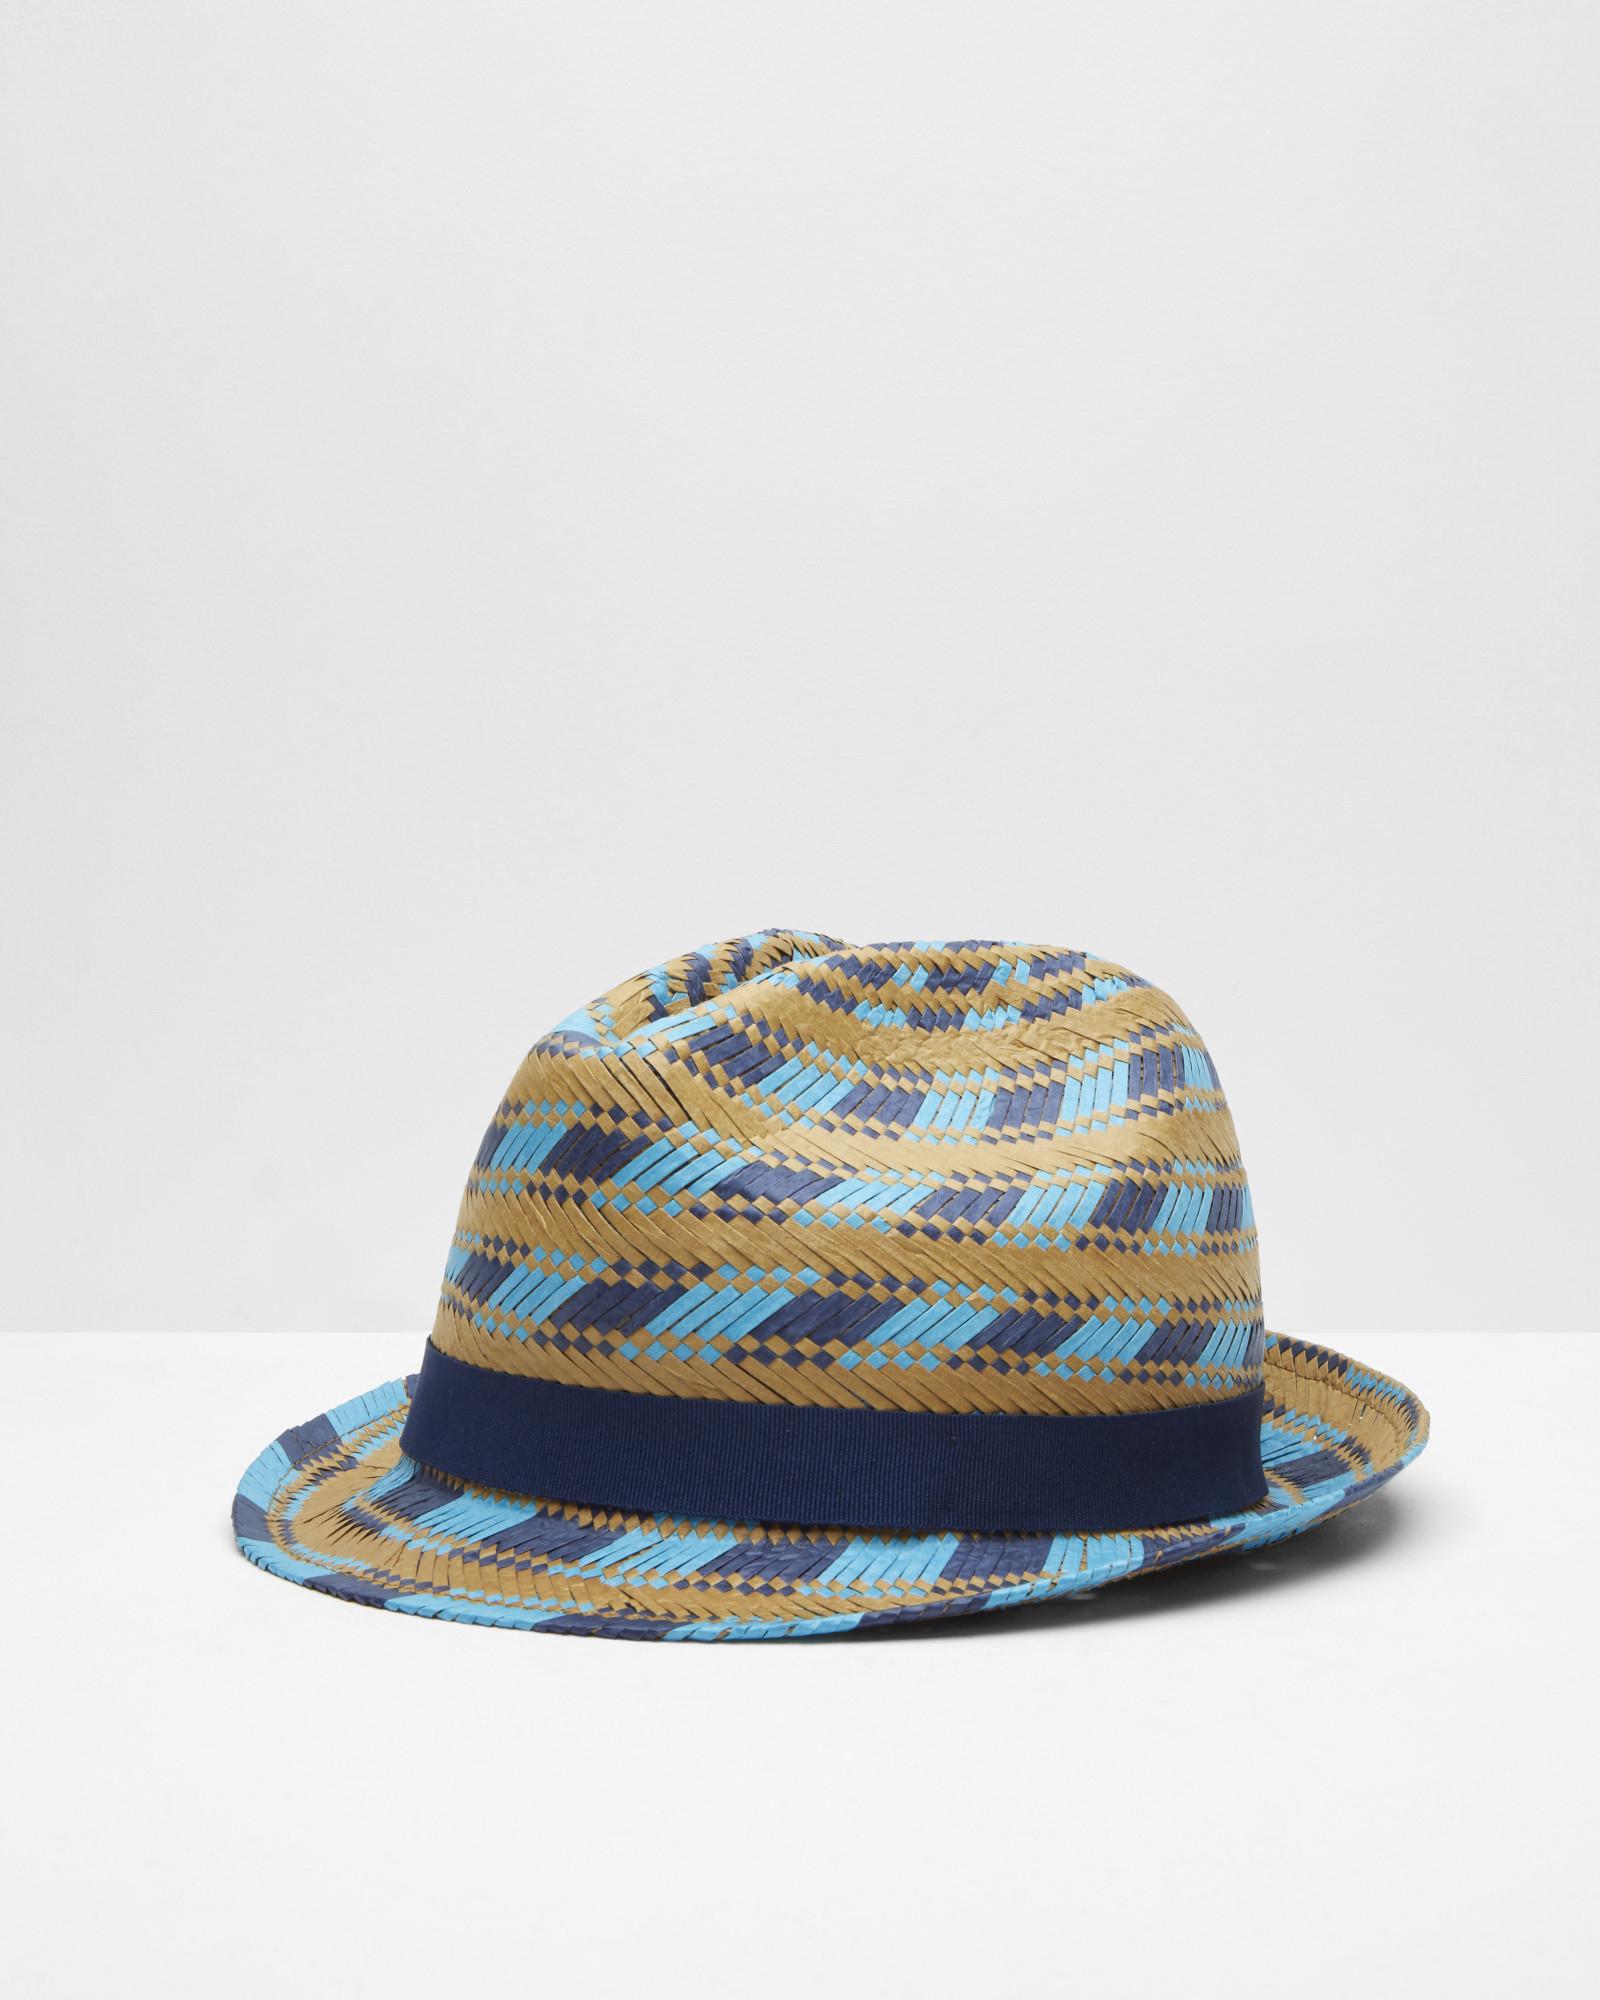 e56de434c8bd2 Ted Baker Multi-coloured Straw Trilby Hat in Natural for Men - Lyst